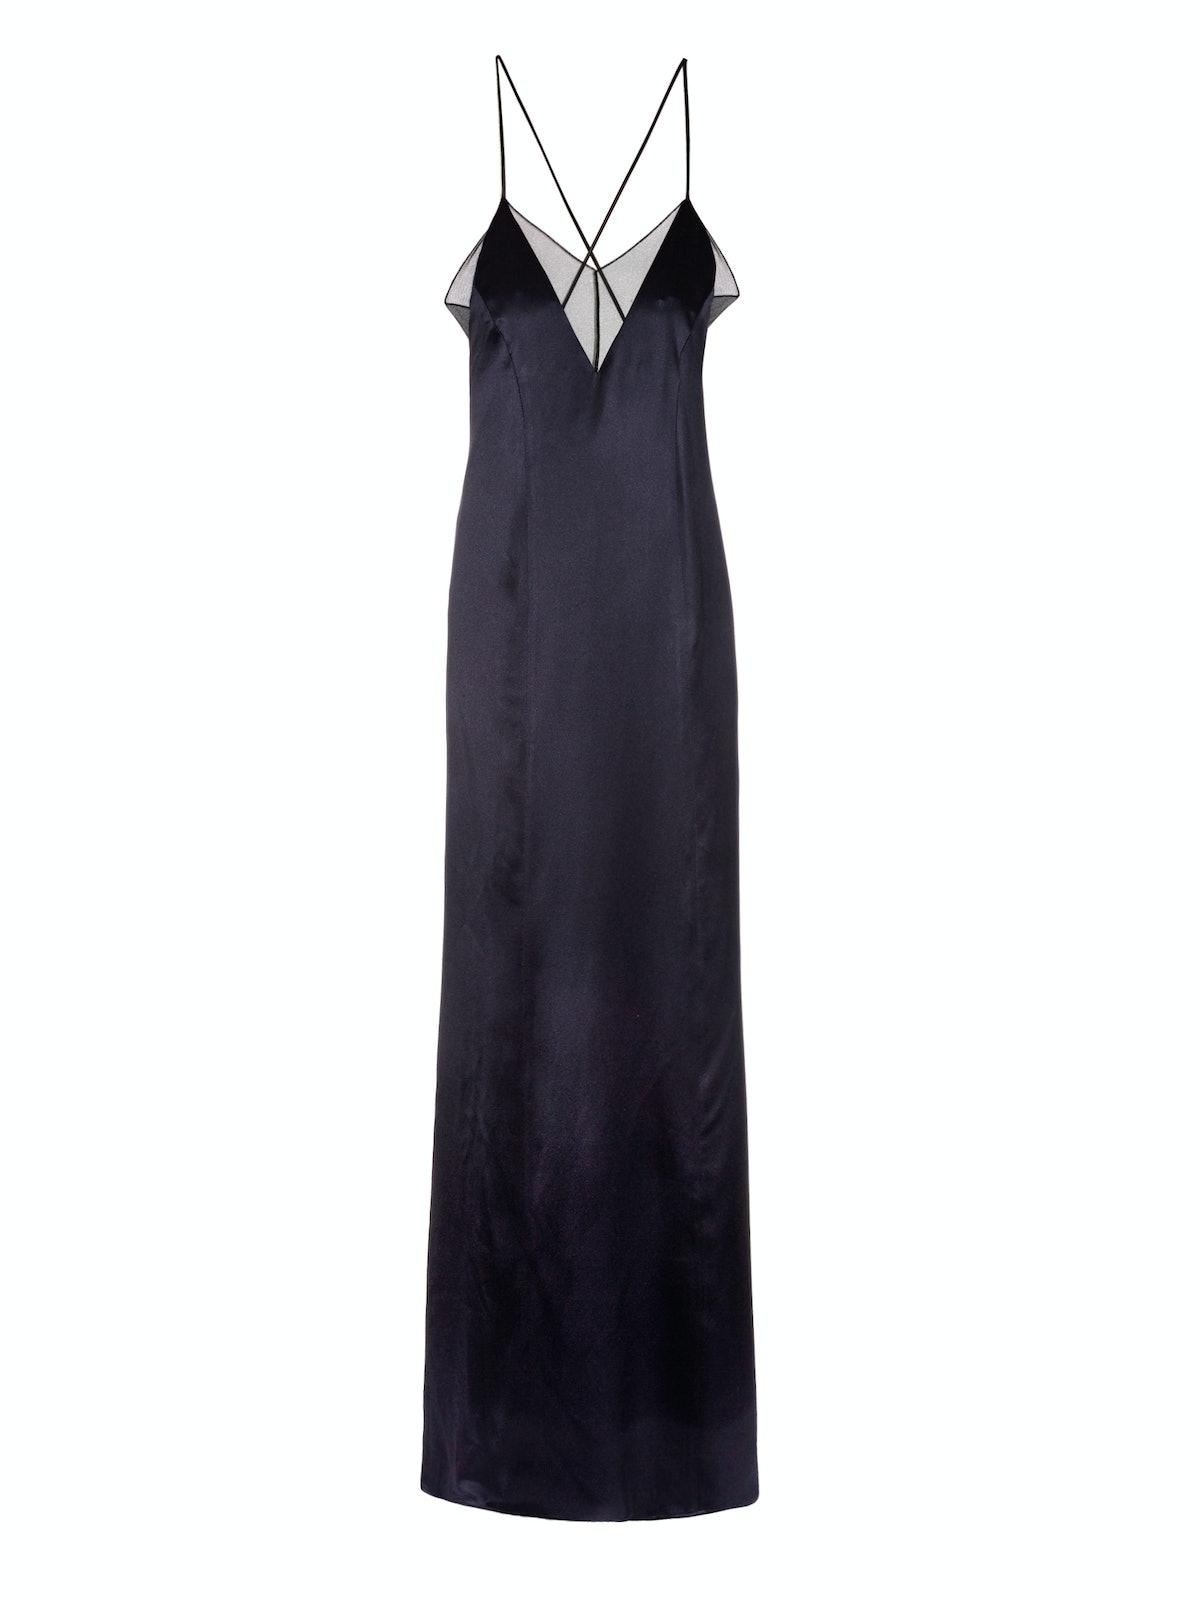 Galvan dress